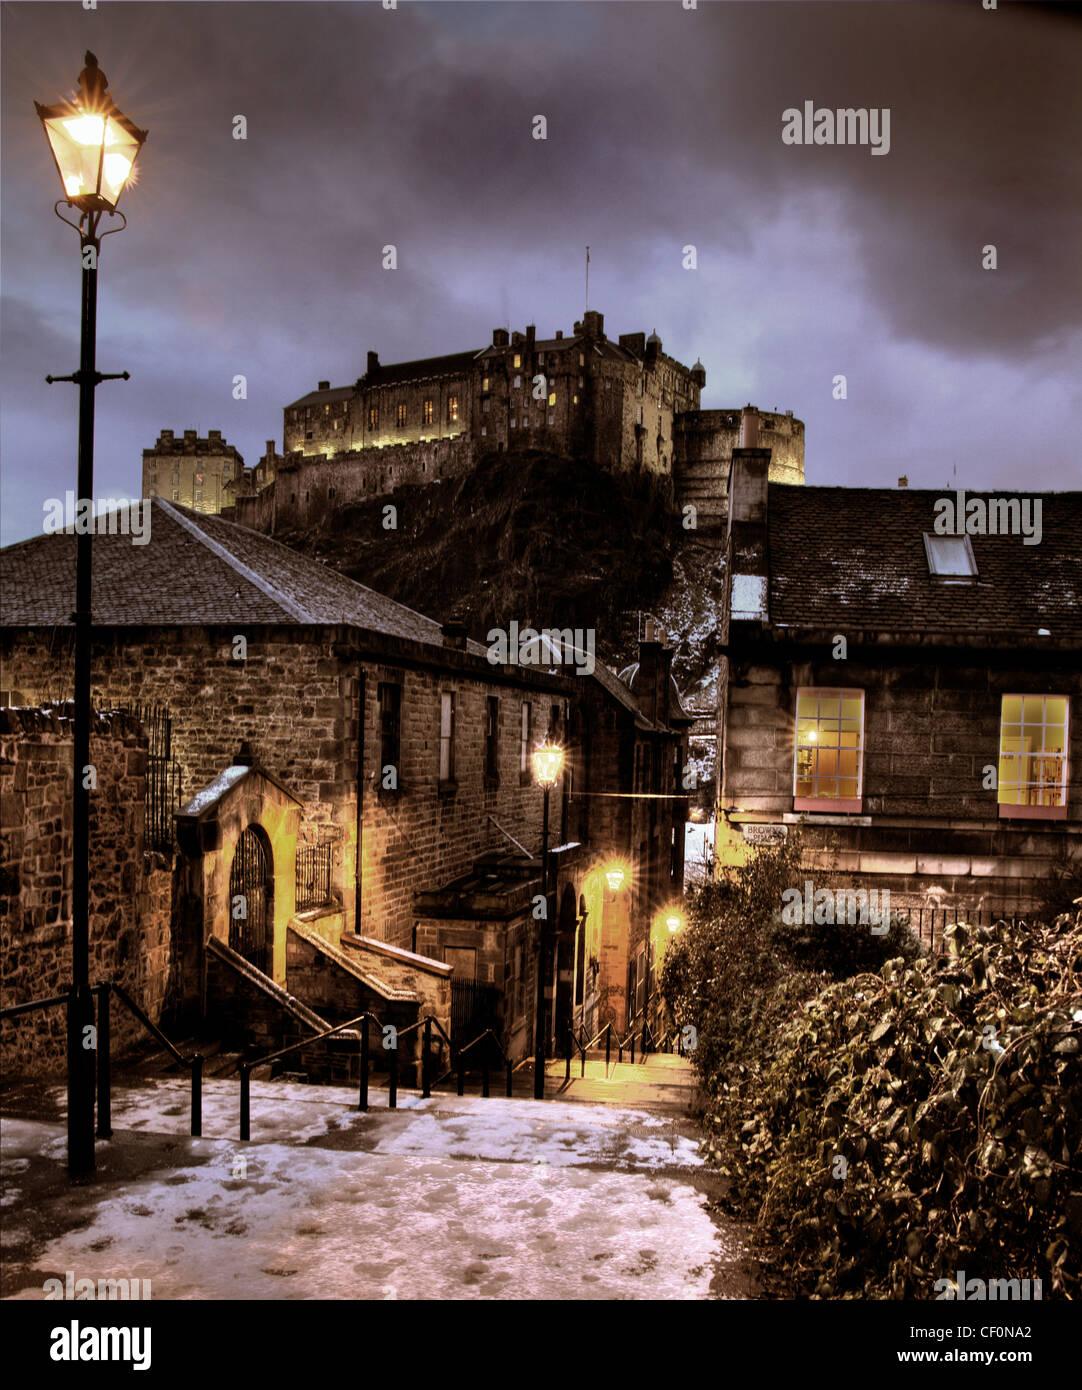 The,Vennel,Edinburgh,Lothian,Scotland,UK,flodden,wall,edinburghcastle,dusk,night,gotonysmith,icon,iconic,scene,capital,old,town,secret,passageway,passage,way,close,fortress,West,port,victorian,street,gas,lamp,Dùn,Èideann,Dun,Eideann,scottish,independance,independence,home,rule,devolution,parliament,oldtown,new,years,eve,hogmanay,Grass,market,grassmarket,junction,of,Bread,Street,Lauriston Street,East,Fountainbridge,and,High,Riggs,evening,tourist,destination,Wester,Portsburgh,gables,best,view,Medieval,Old,Town,ecosse,festival,fringe,Beltane,Fire,Festival,tourist,tour,tours,gotonysmith,Ediburgh,Buy Pictures of,Buy Images Of